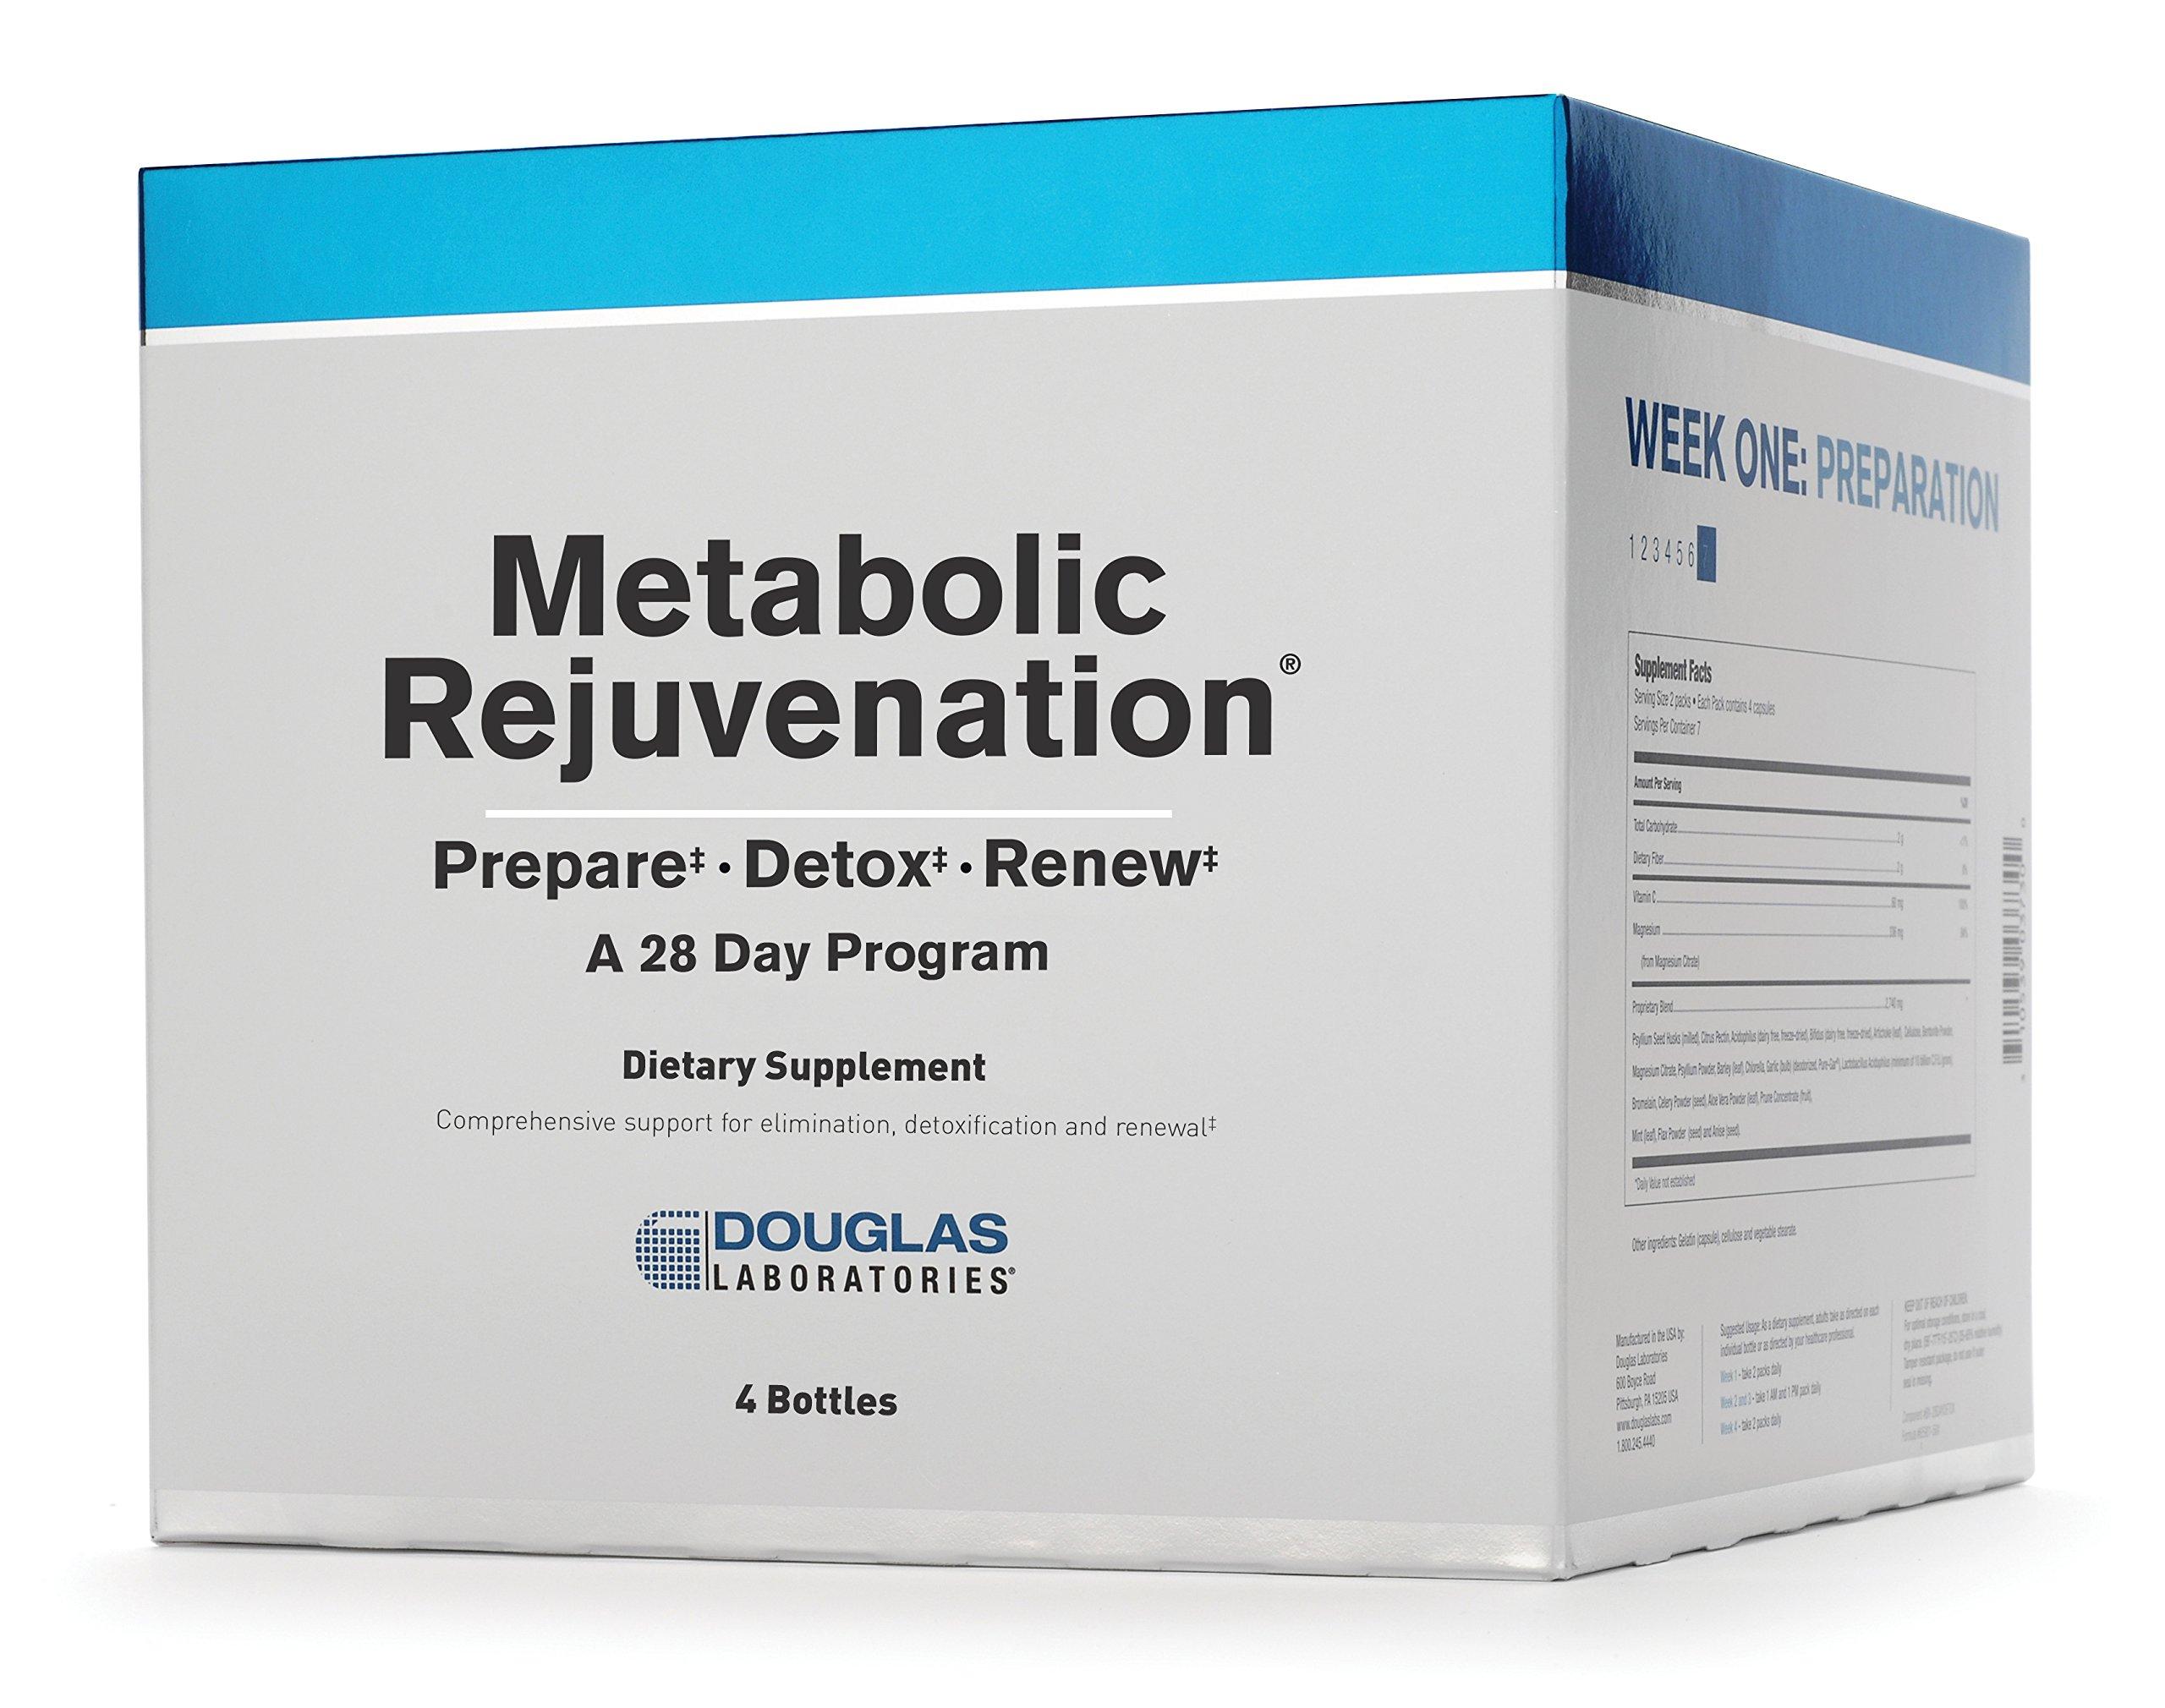 Douglas Laboratories - Metabolic Rejuvenation - A 28 Day Program for Elimination, Detoxification, and Renewal - 4 Bottles